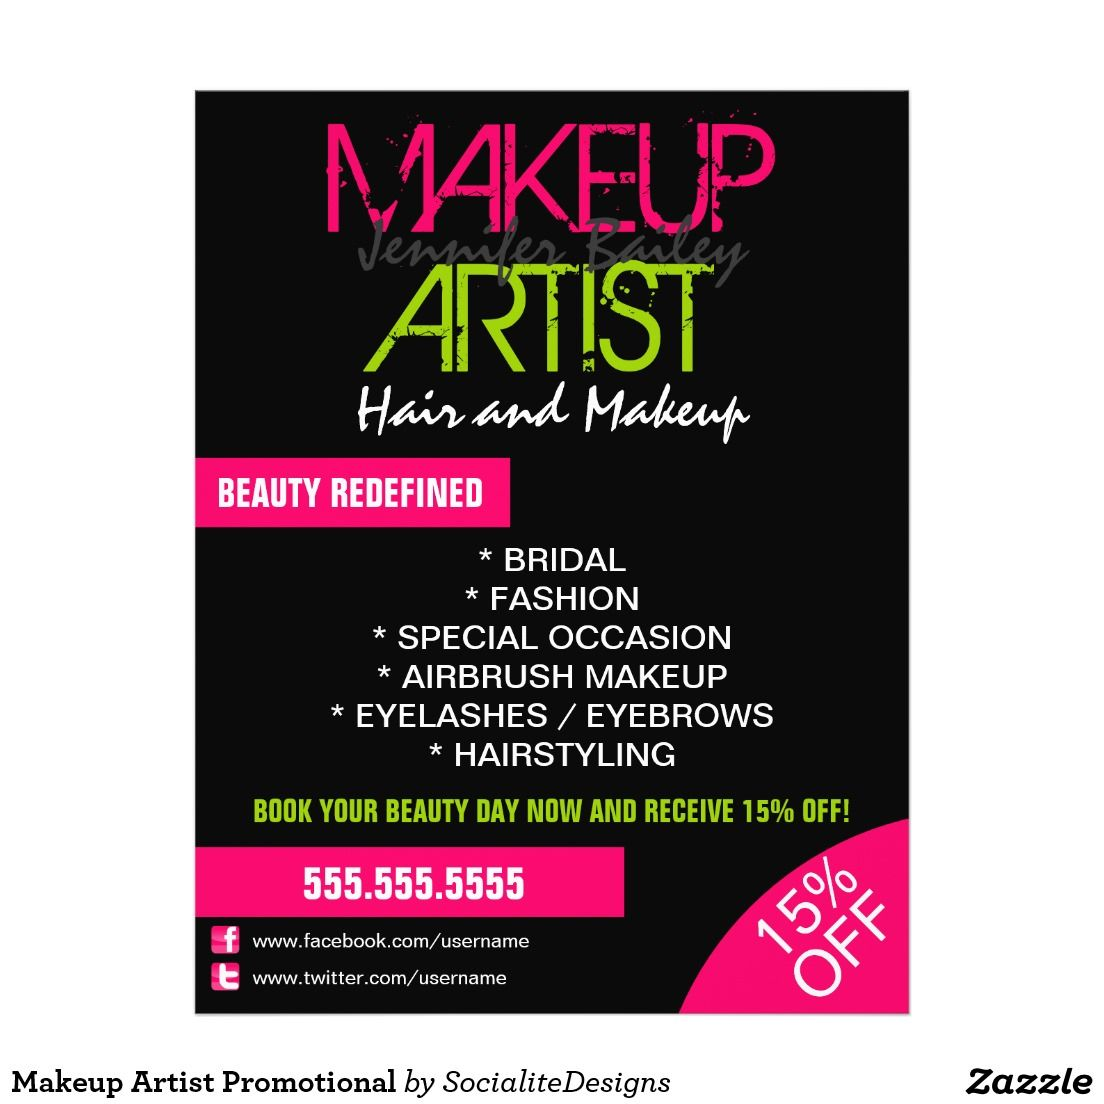 Makeup Artist Promotional Flyer Advertising Pinterest Makeup